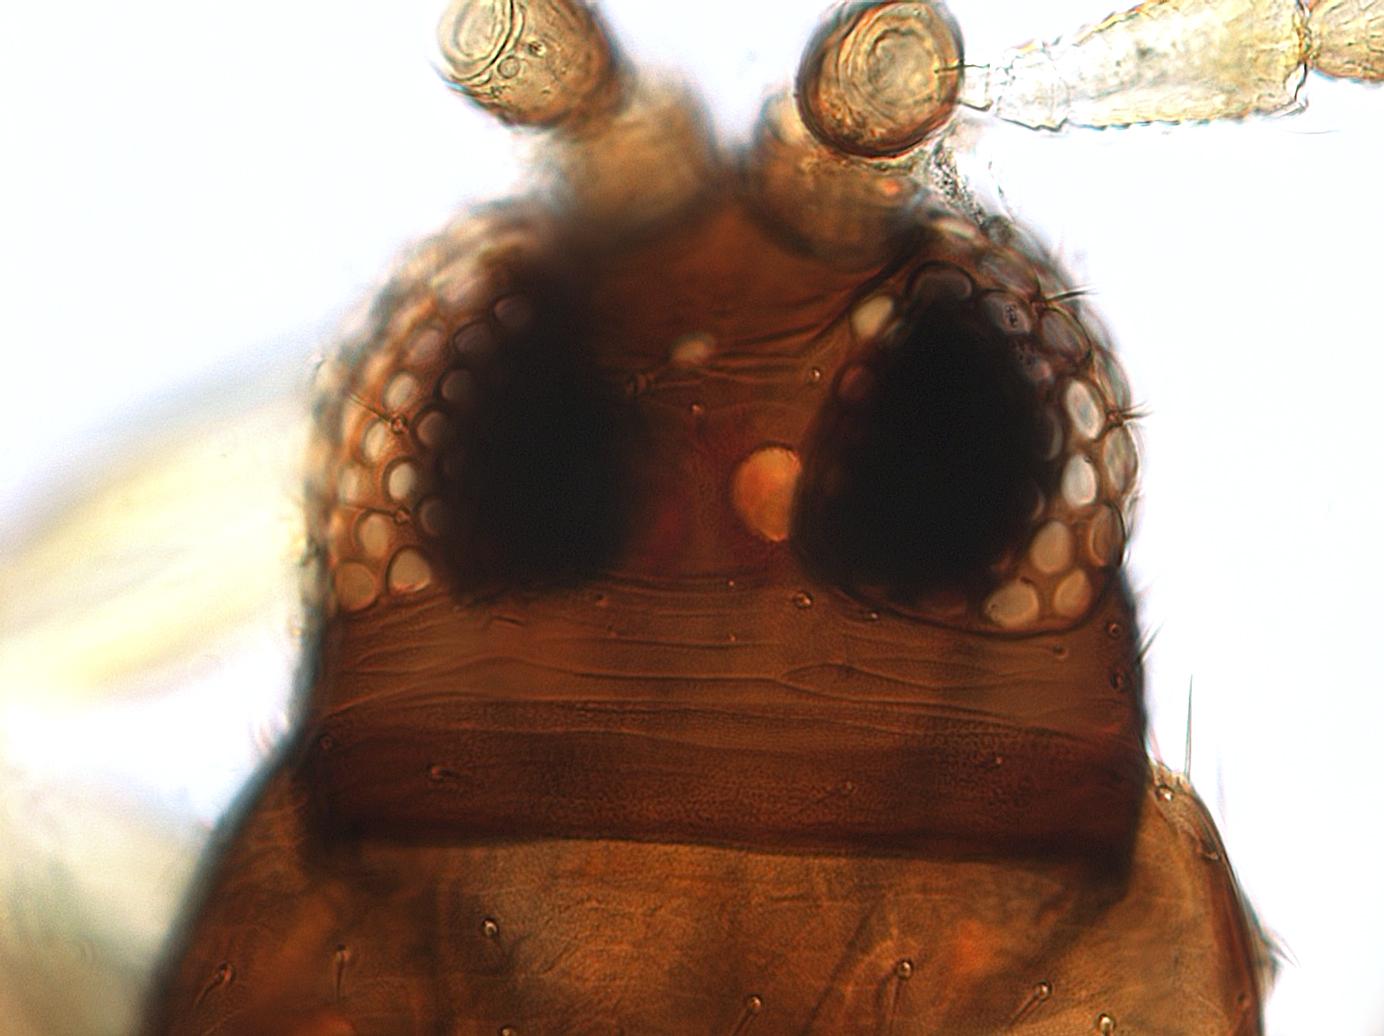 Heterothrips varitibia